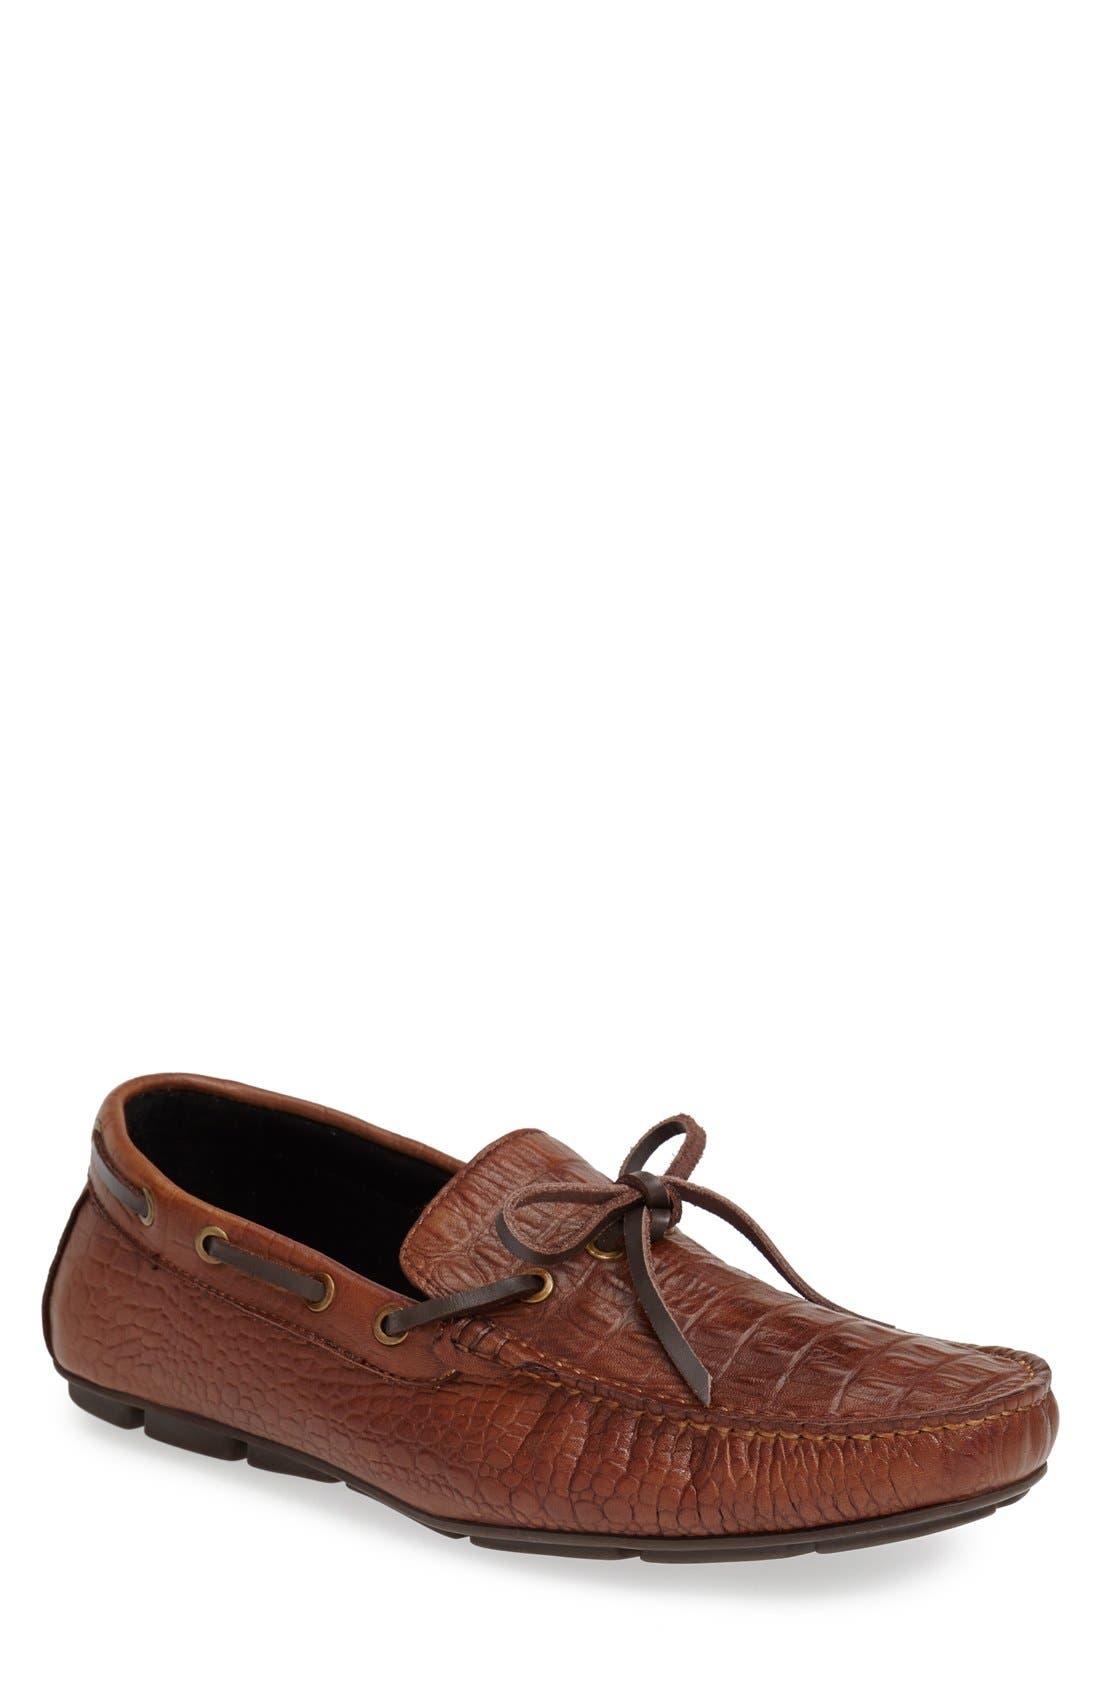 'Arbon' Loafer, Main, color, 201